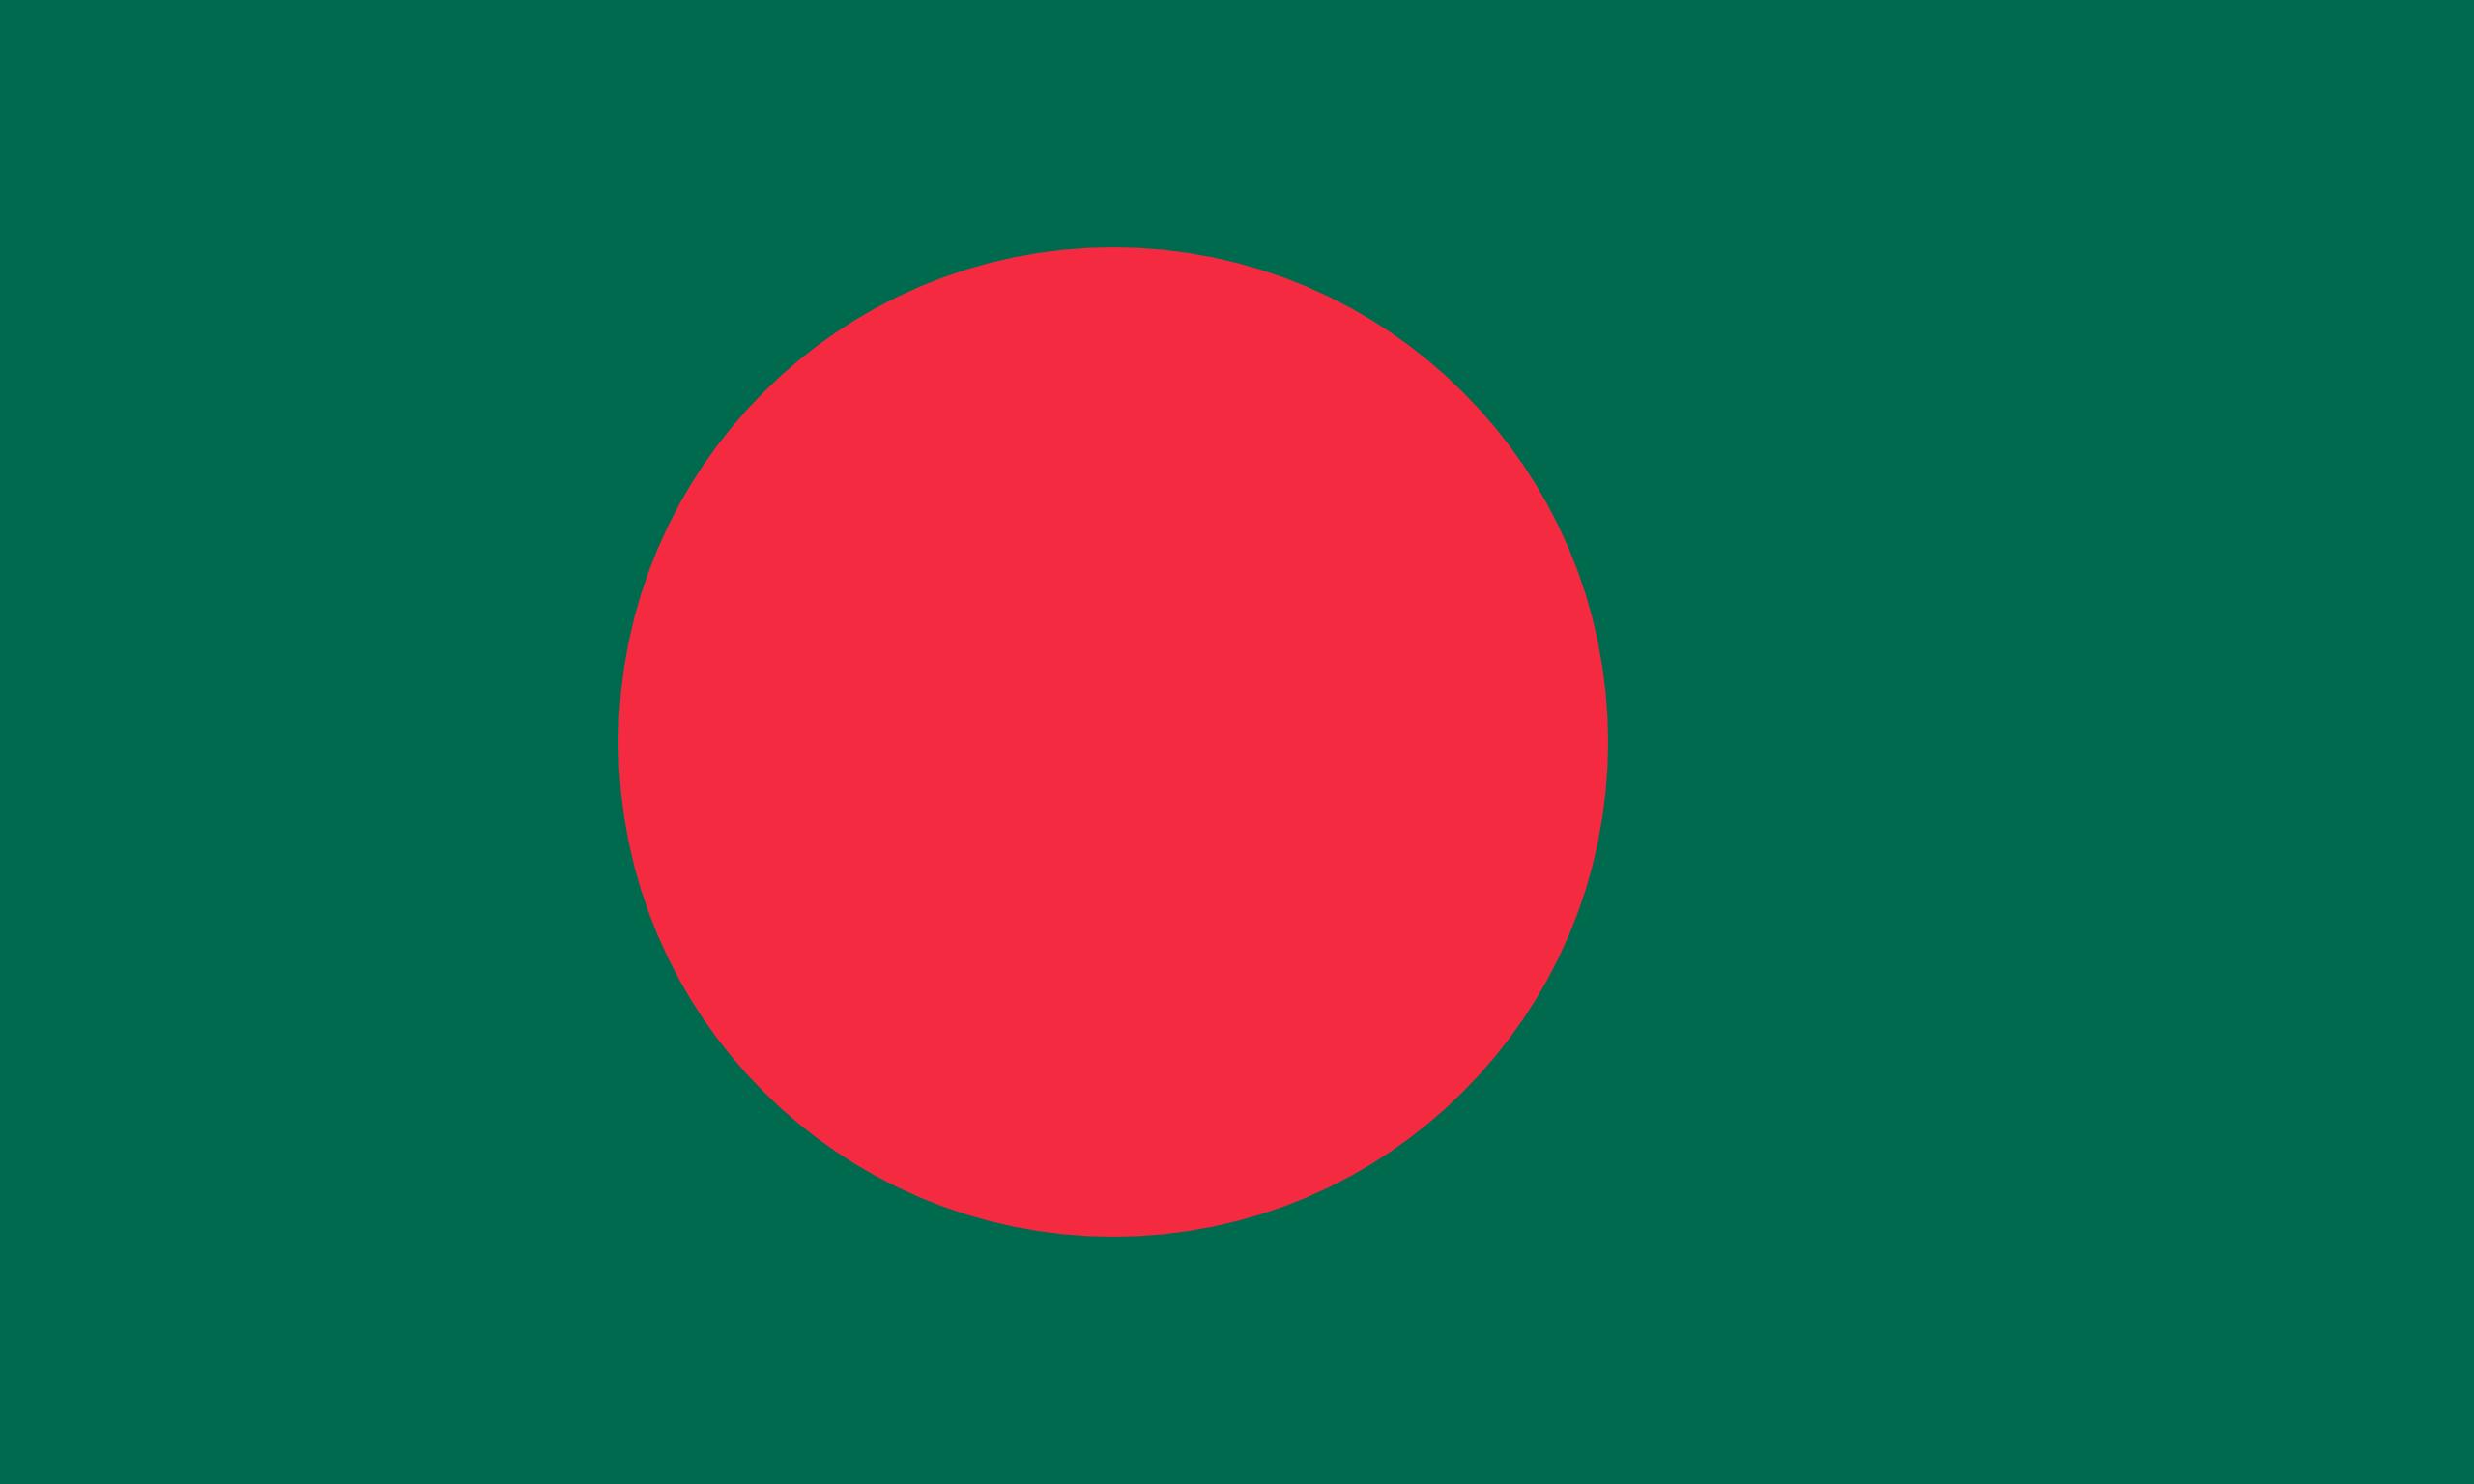 bangladesh, país, emblema, insignia, символ - Обои HD - Профессор falken.com